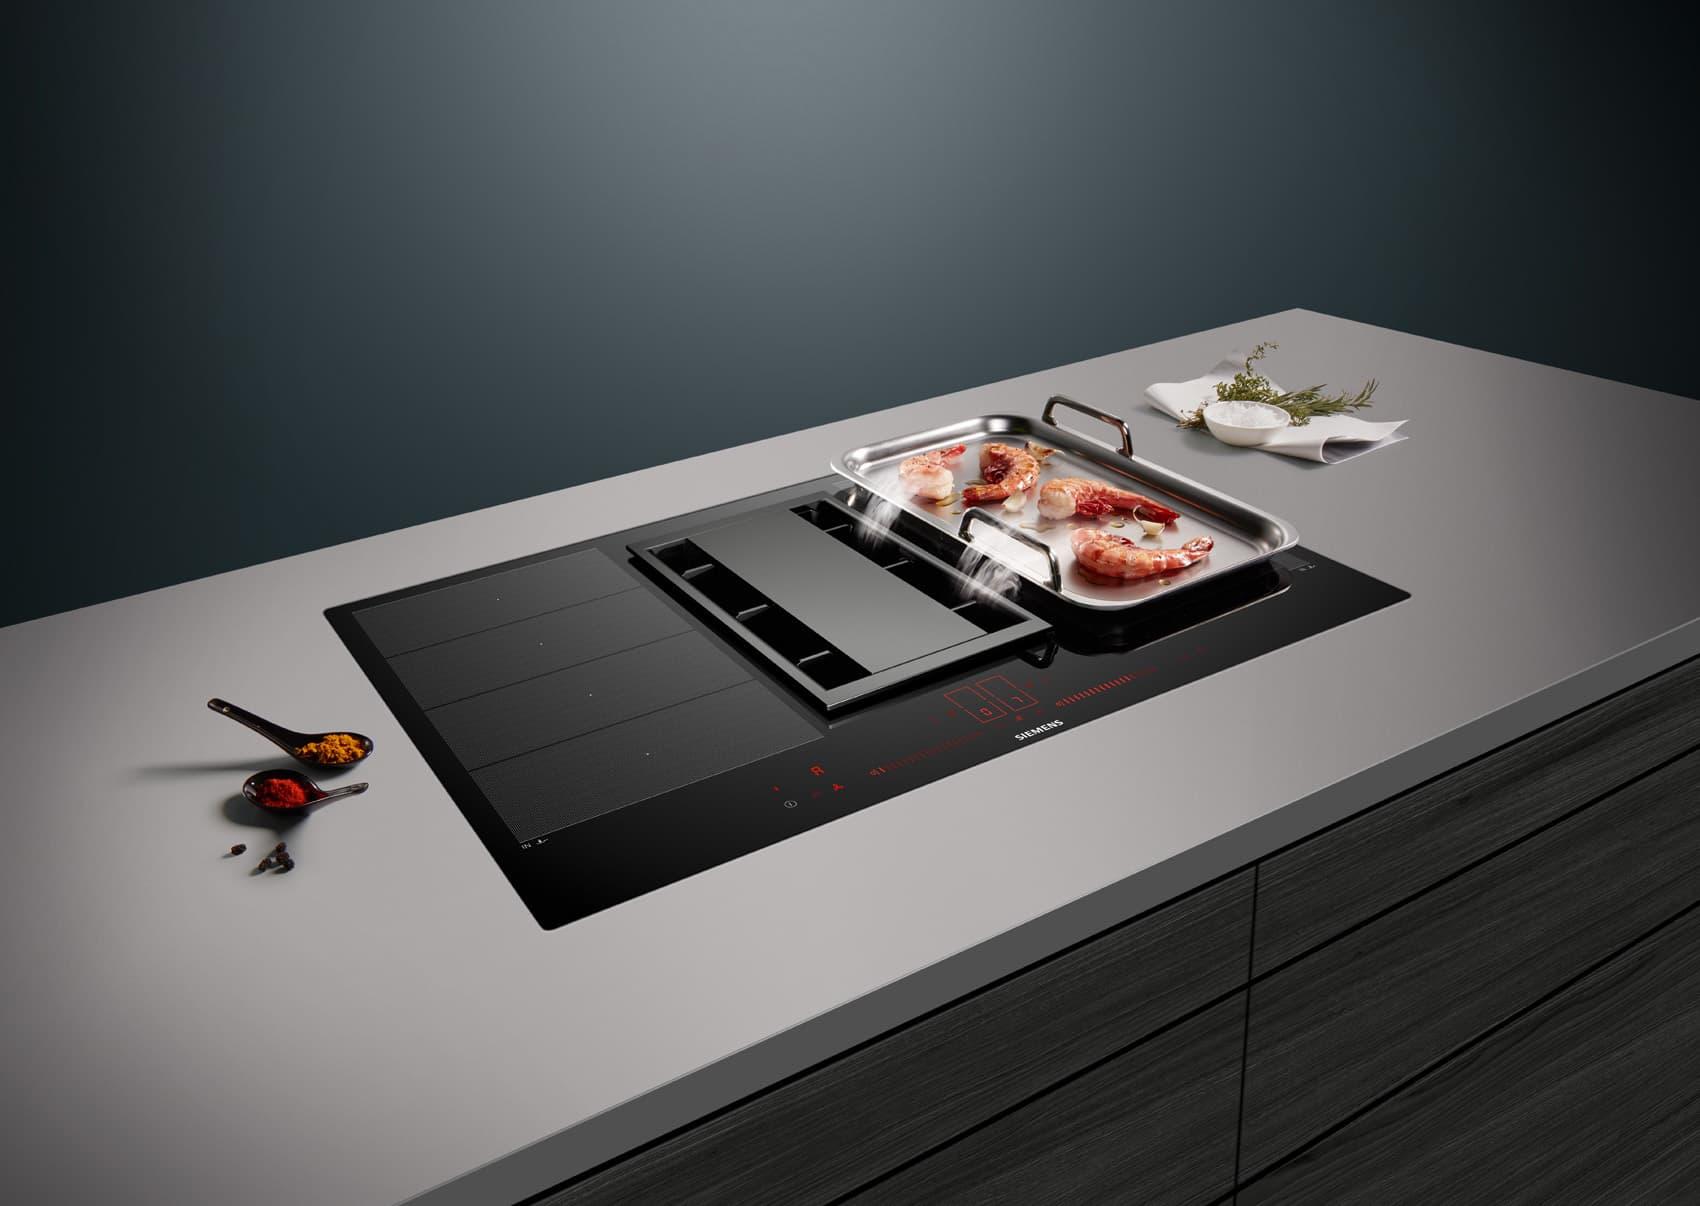 Trends In Keukenapparatuur : Siemens studioline keukenapparatuur keukenstudio regio oost